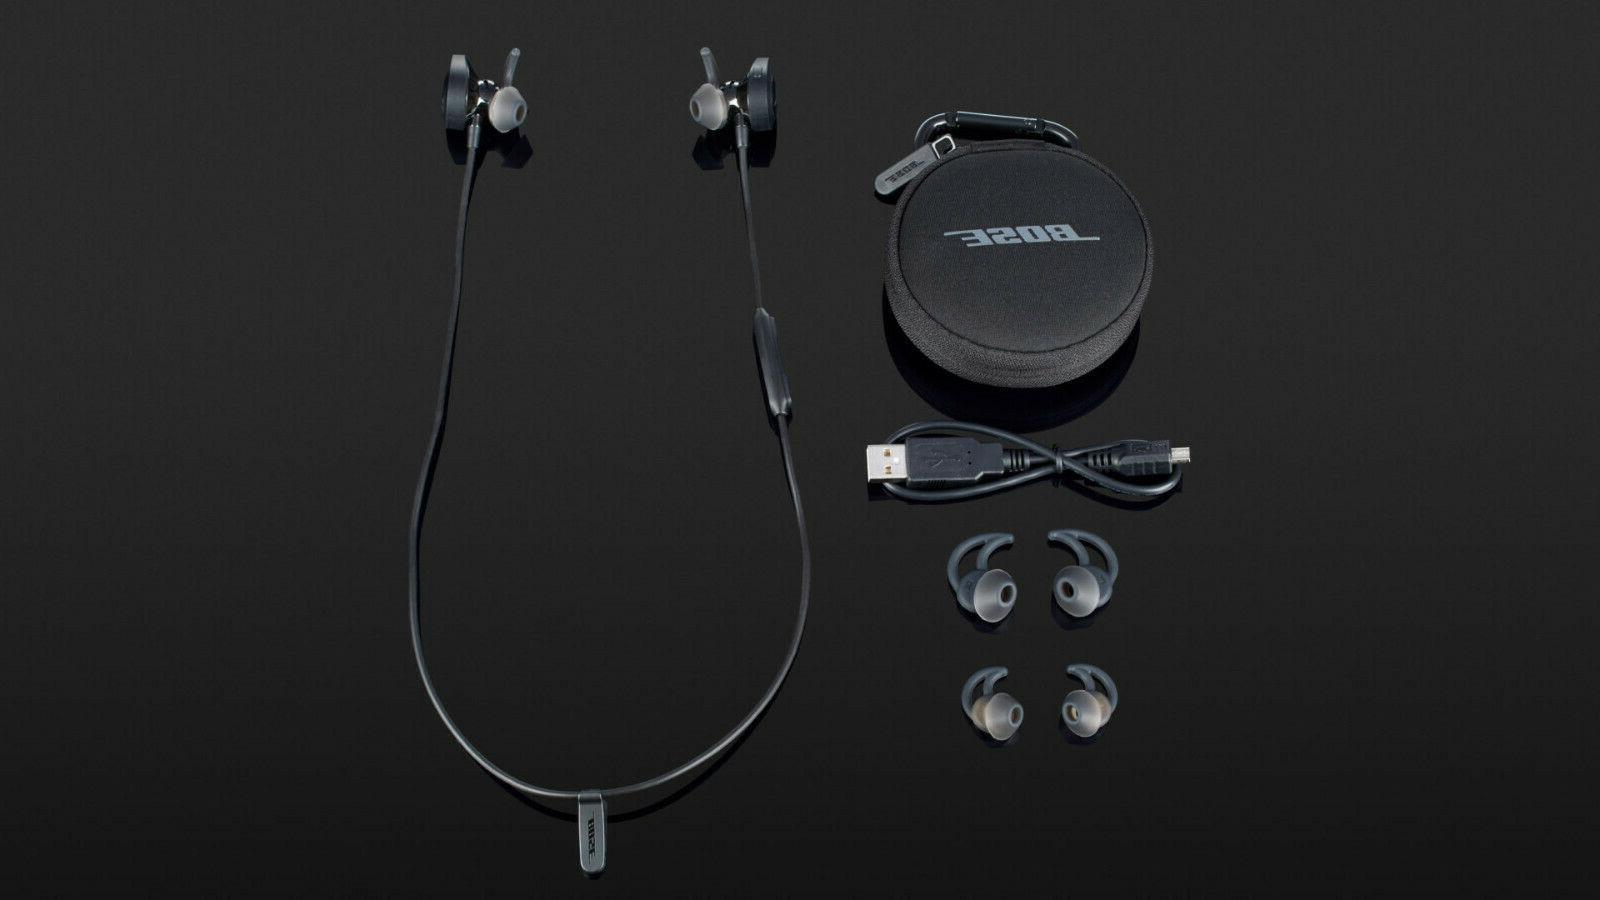 soundsport wireless bluetooth headphones headset earbuds nec